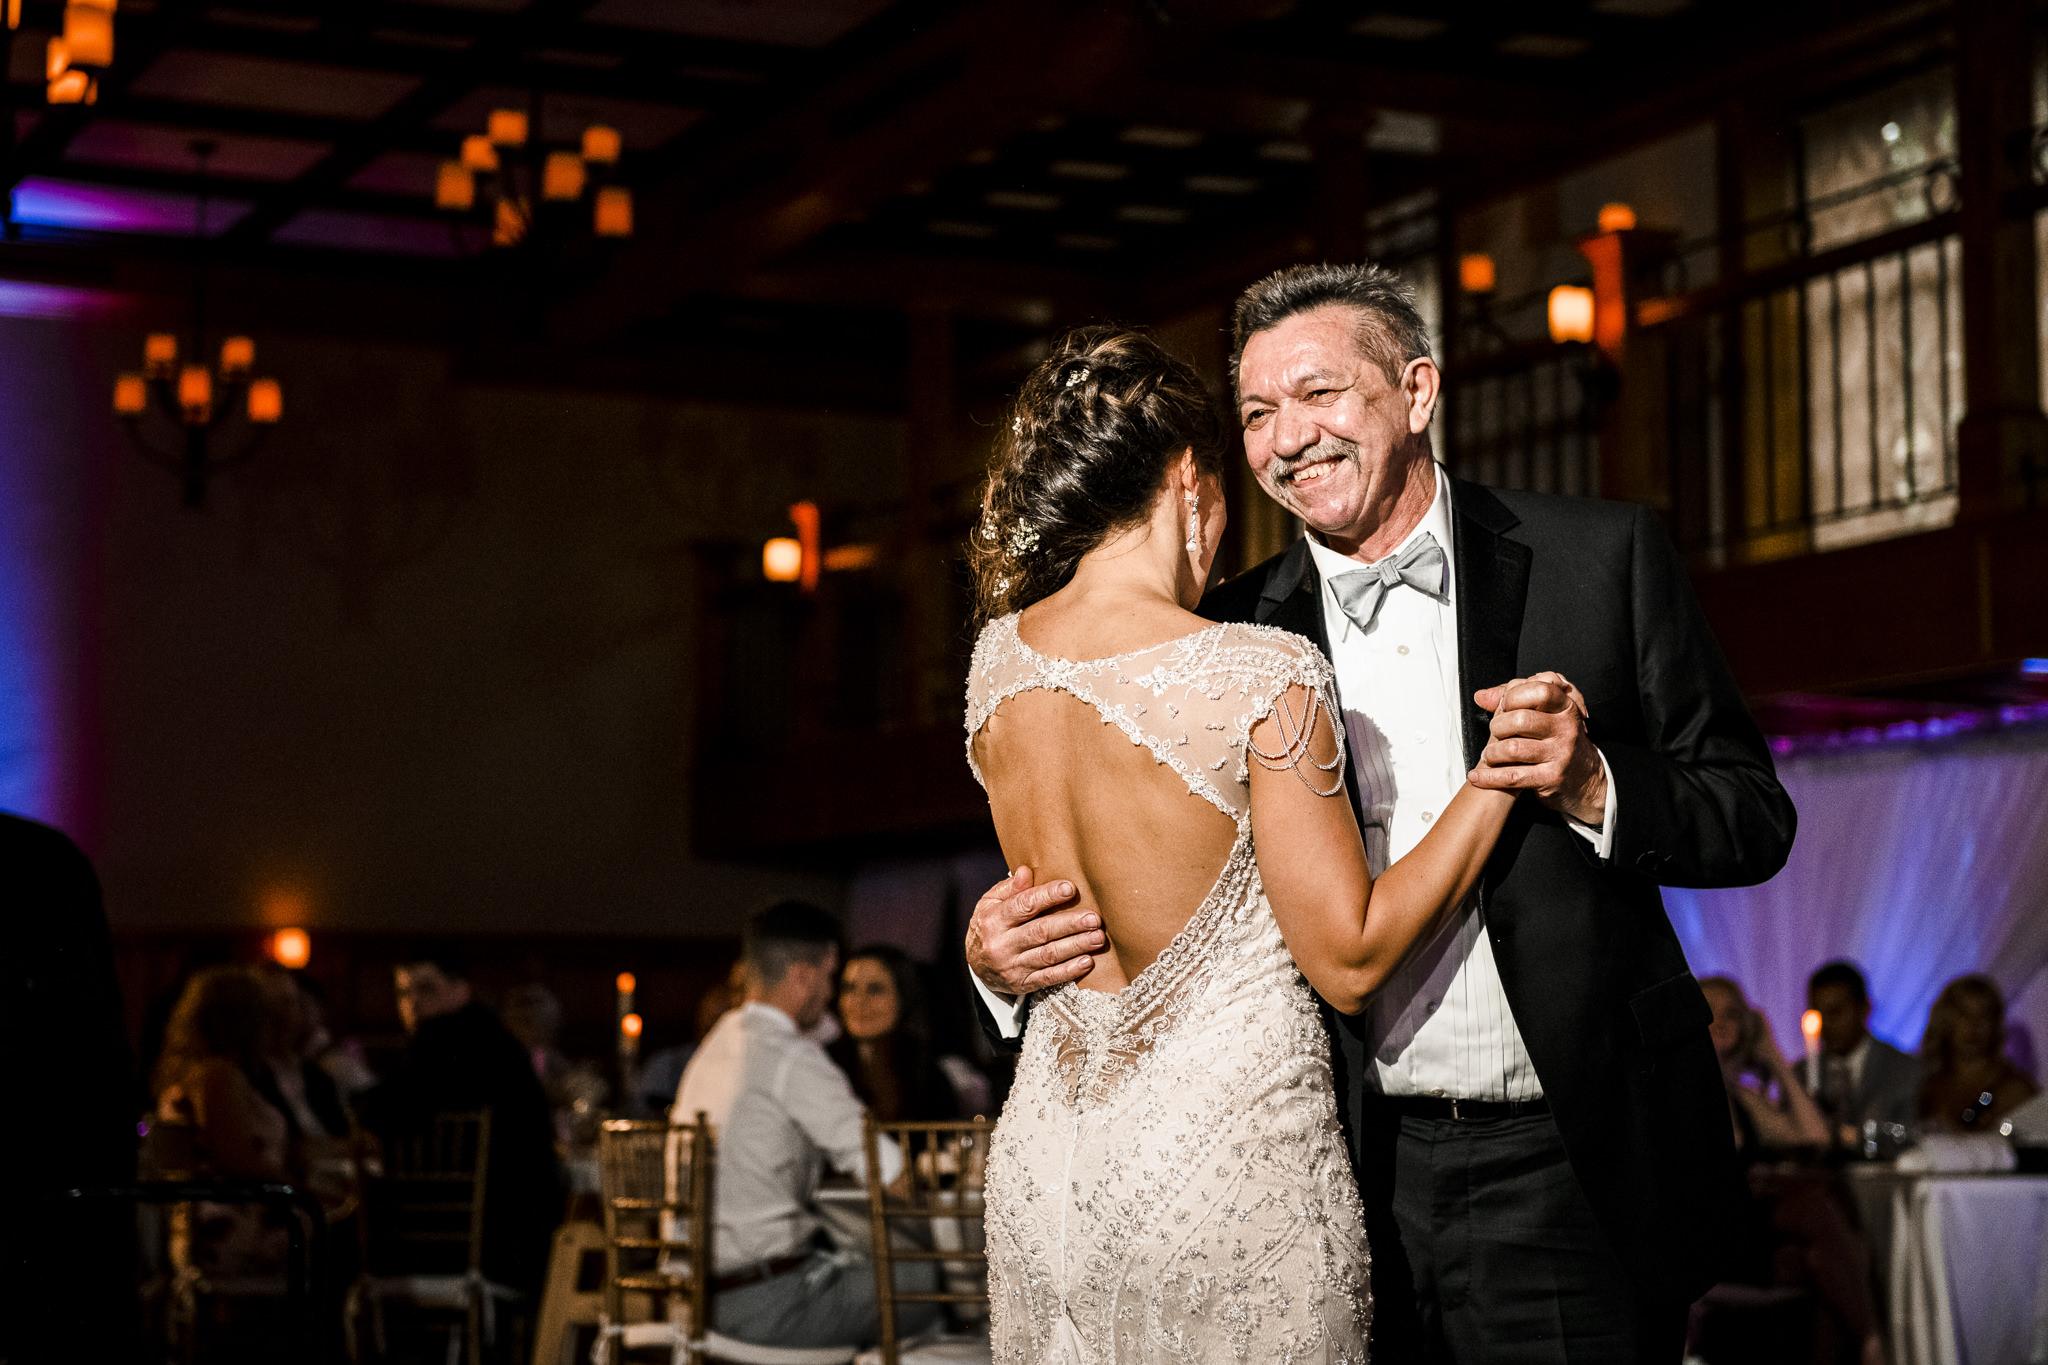 Barbato-Moorestown-Community-House-Wedding-New-Jersey-Photographer-30.JPG